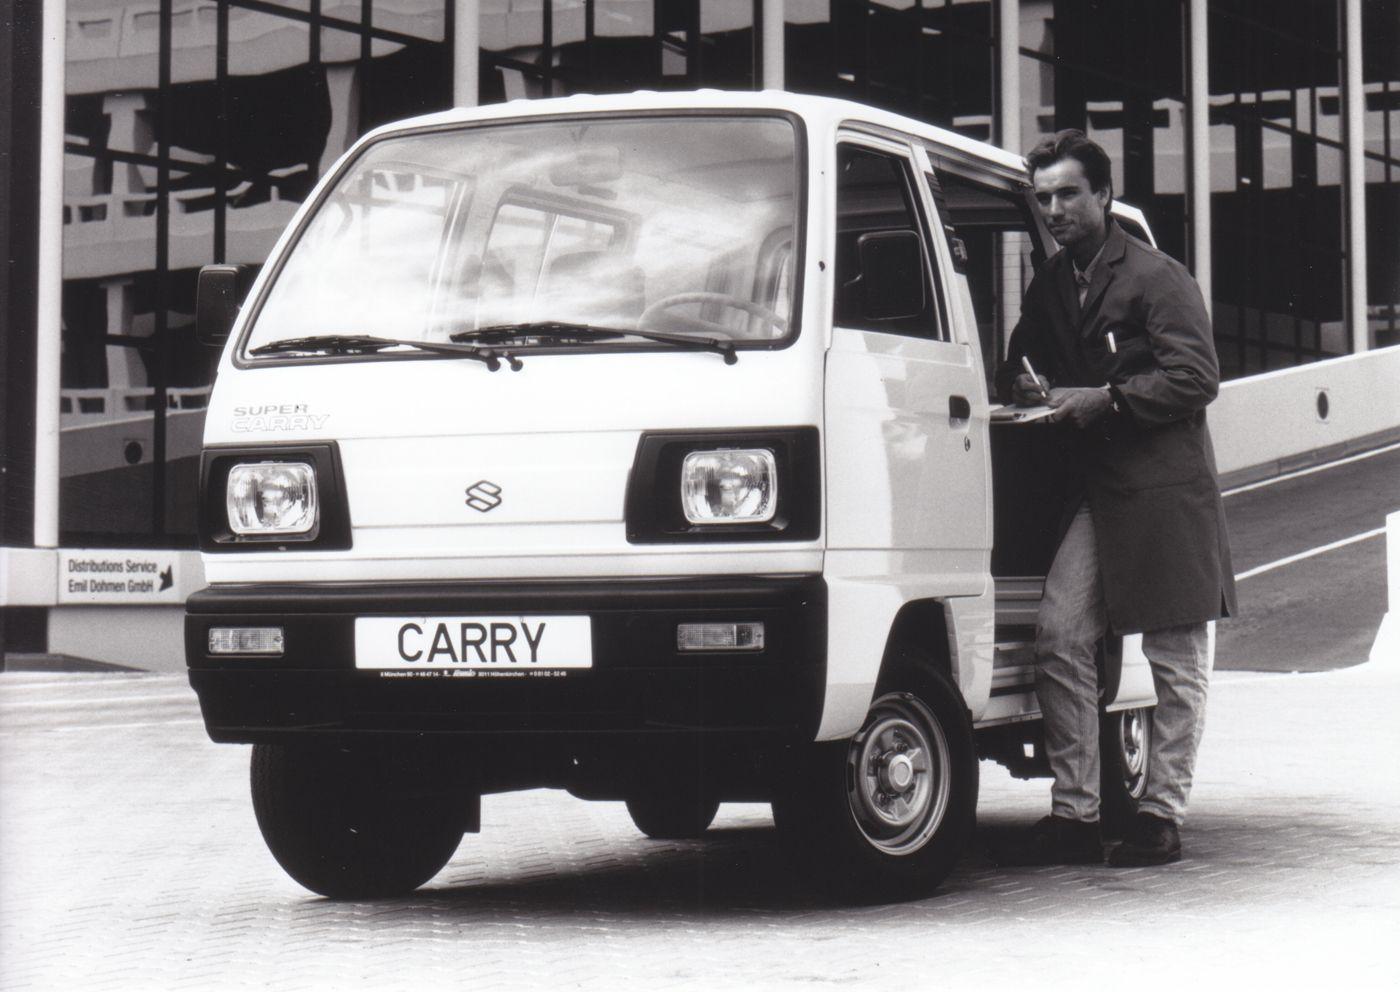 Suzuki Super Carry Kombi Sept 95 Suzuki Van Press Photo